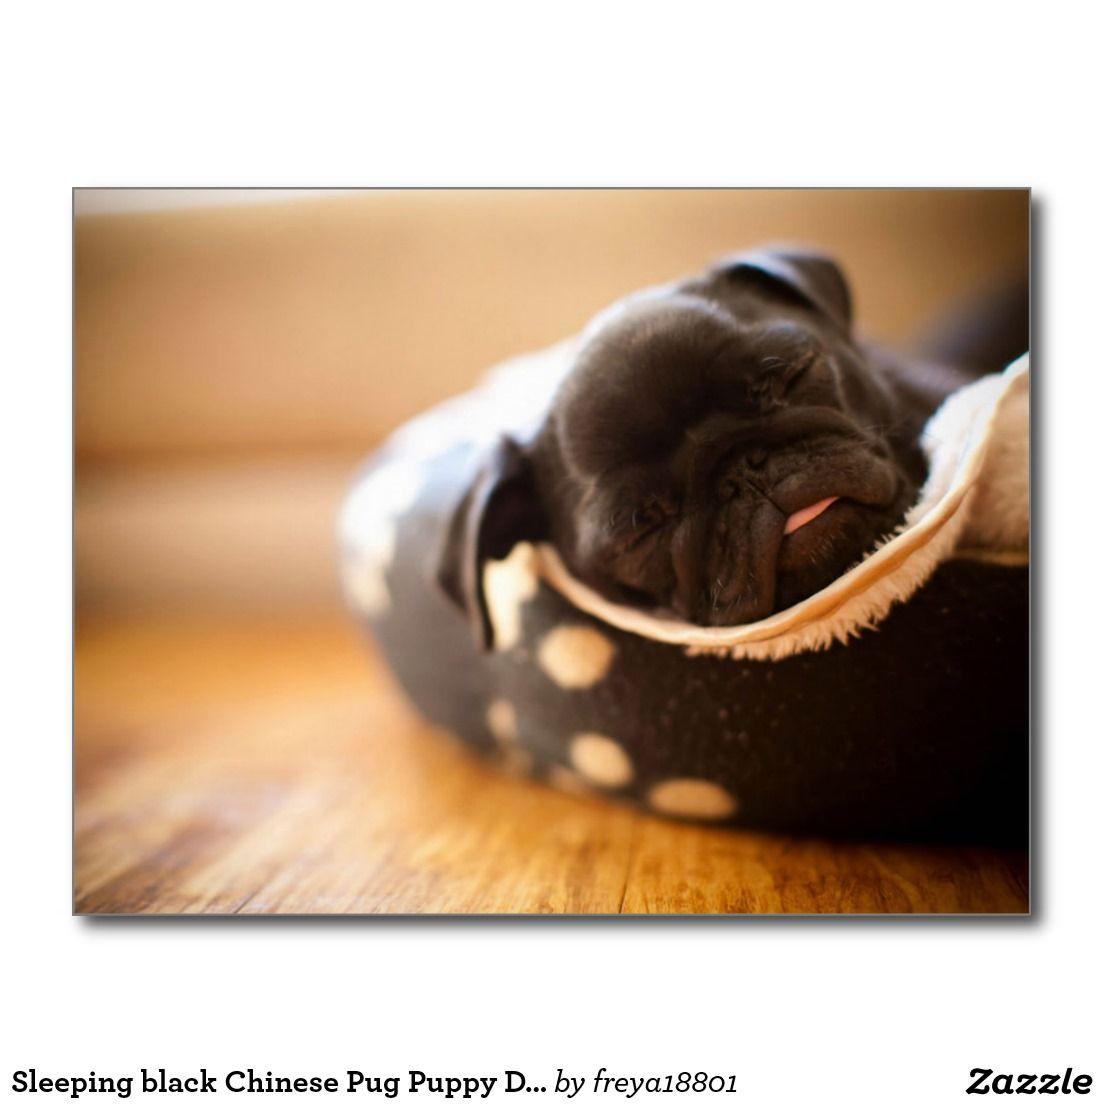 Sleeping Black Chinese Pug Puppy Dog Postcard Zazzle Com Baby